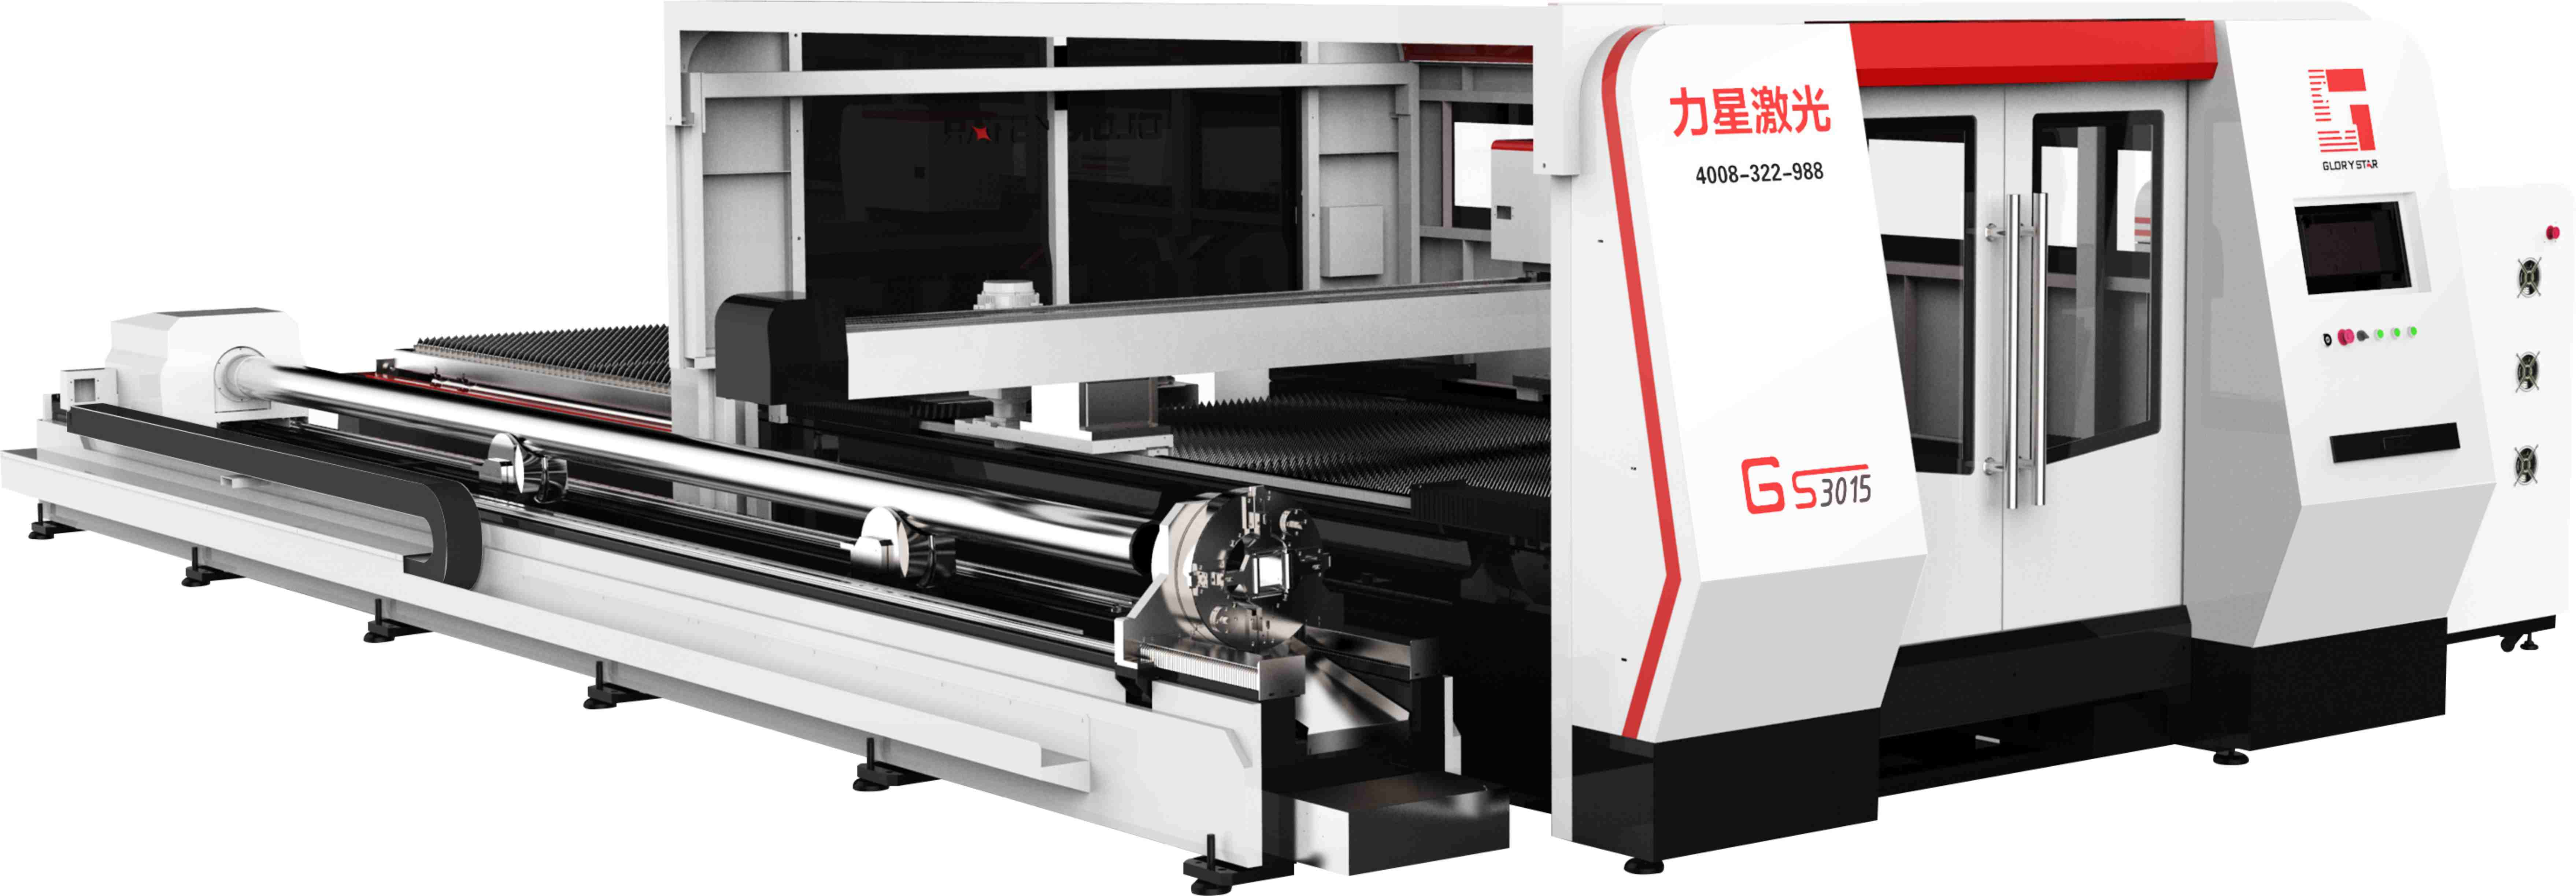 Máy cắt Laser 3015SG